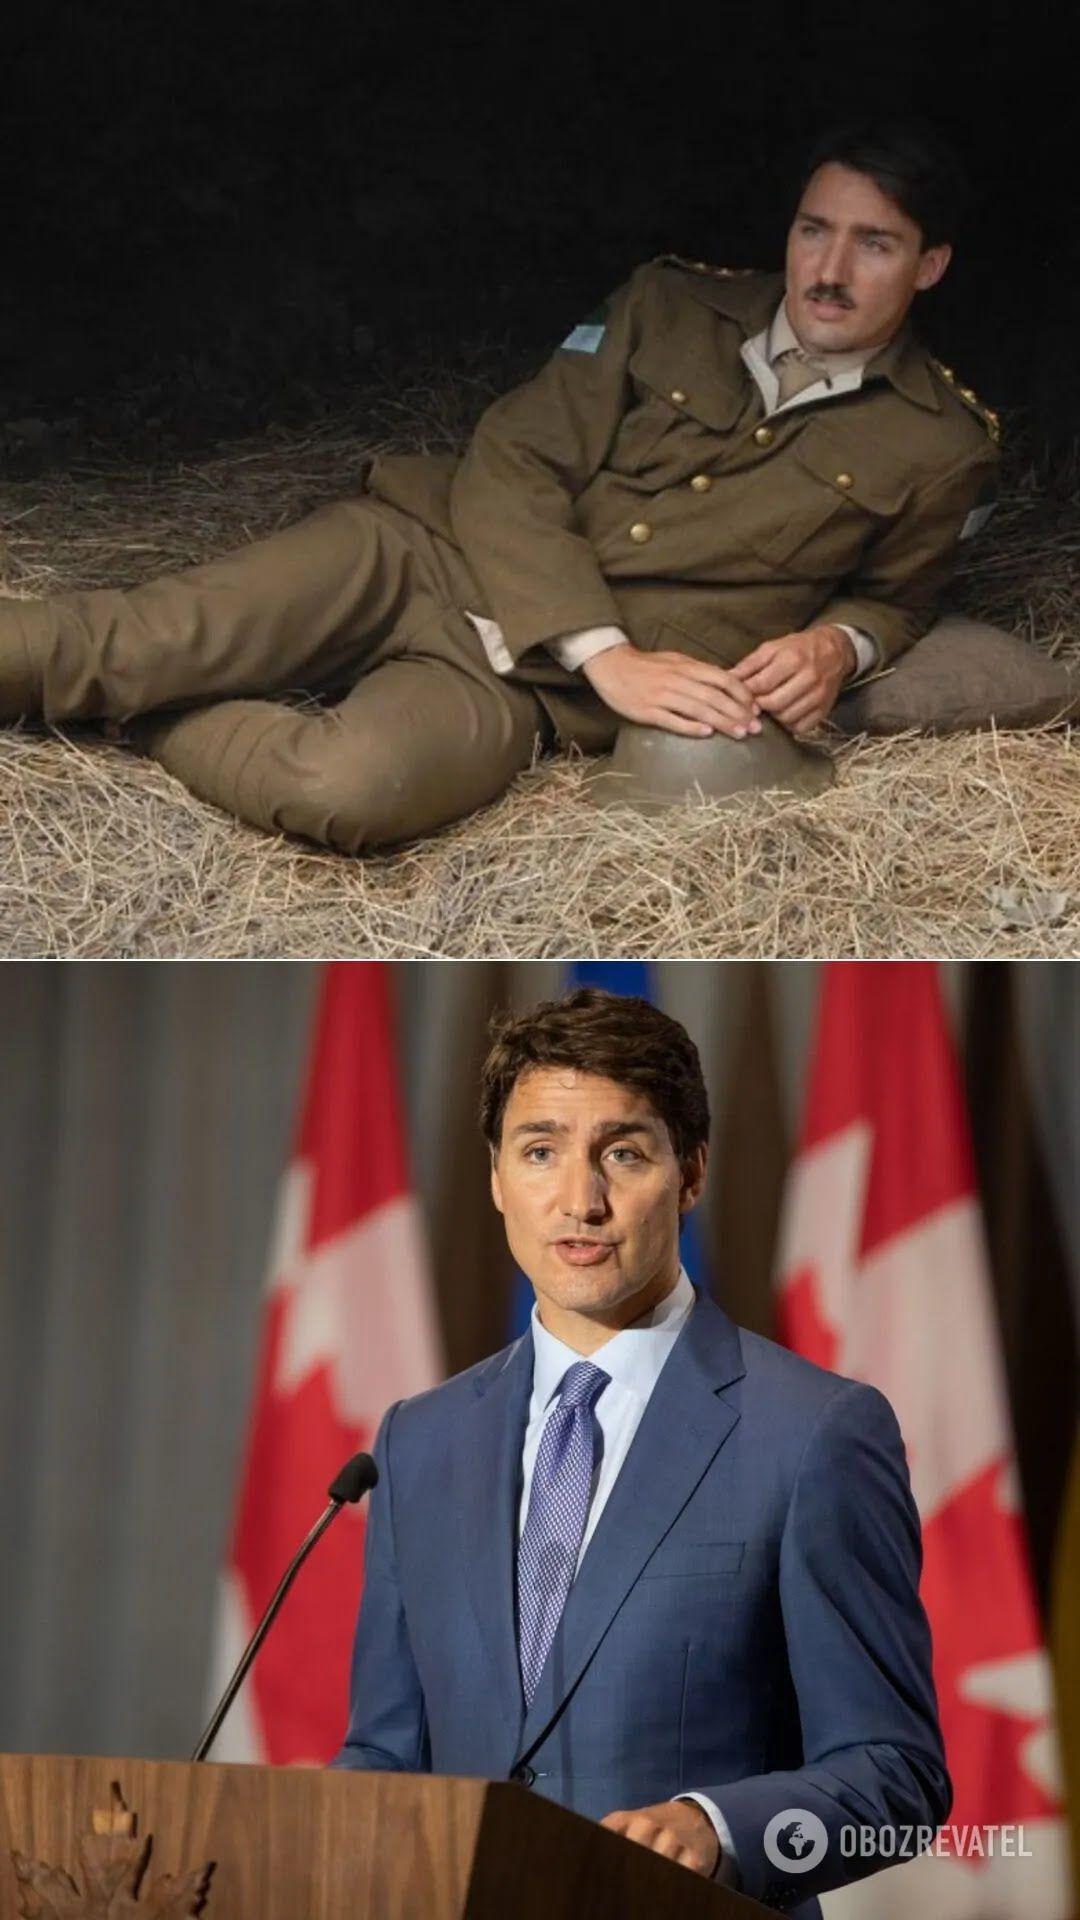 Актер Джастин Трюдо стал премьером Канады